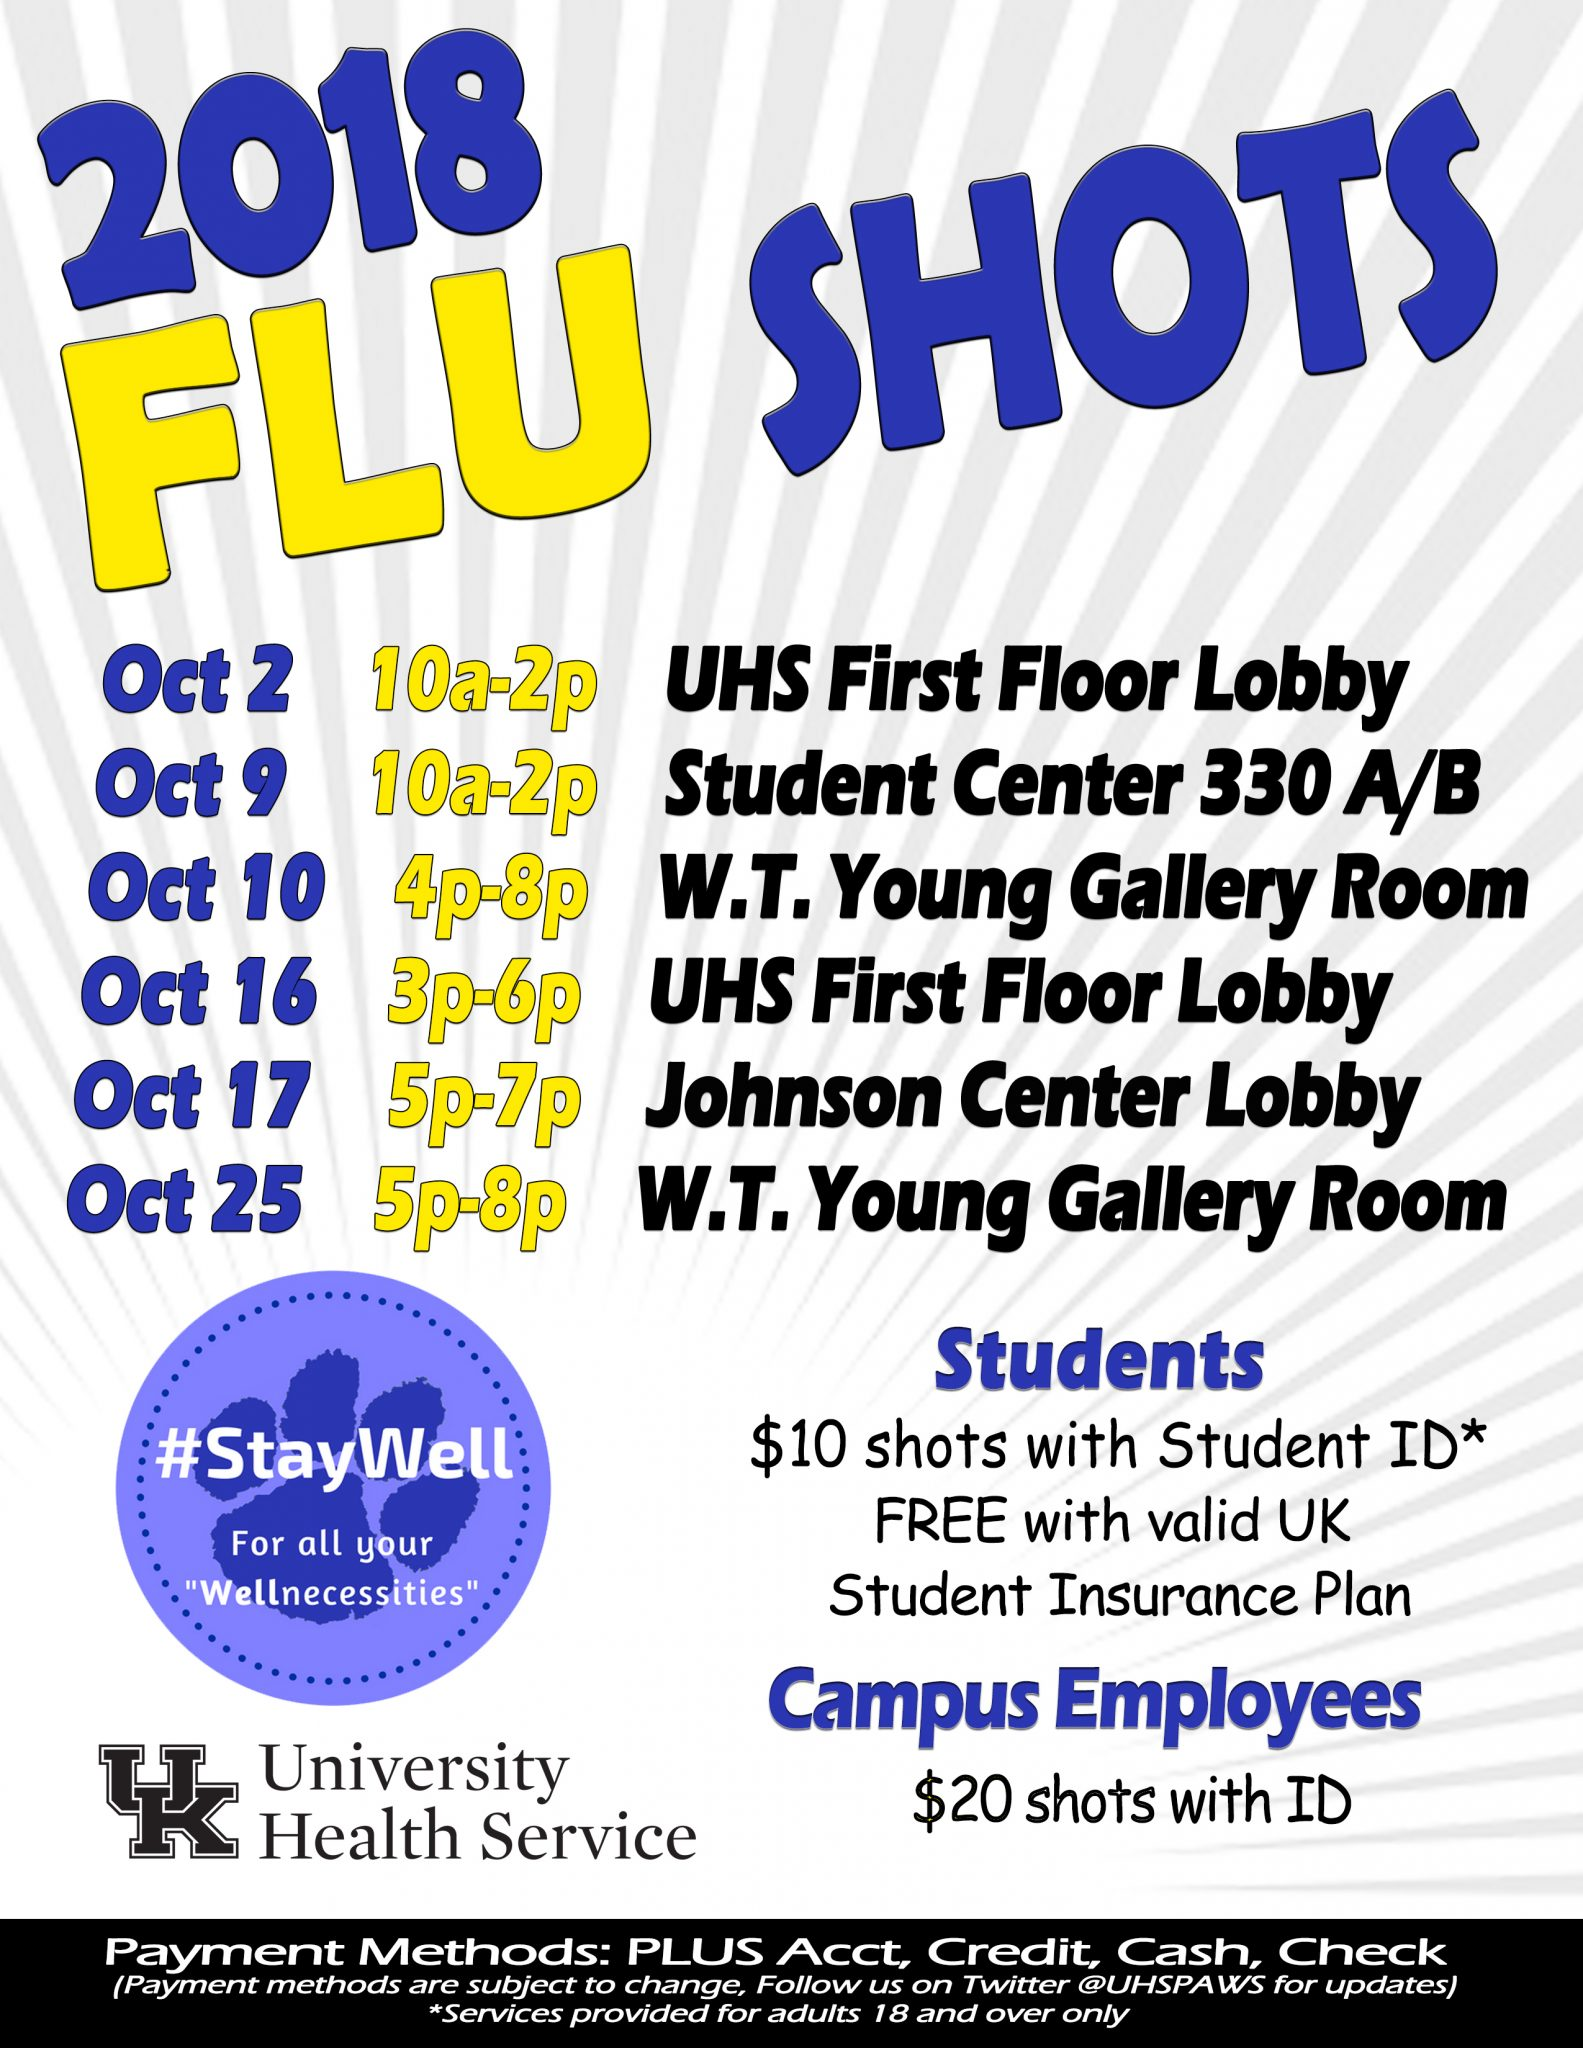 Flu Vaccine Flyers Free: 2018-UHS-Campus-Flu-Shot-Flyer